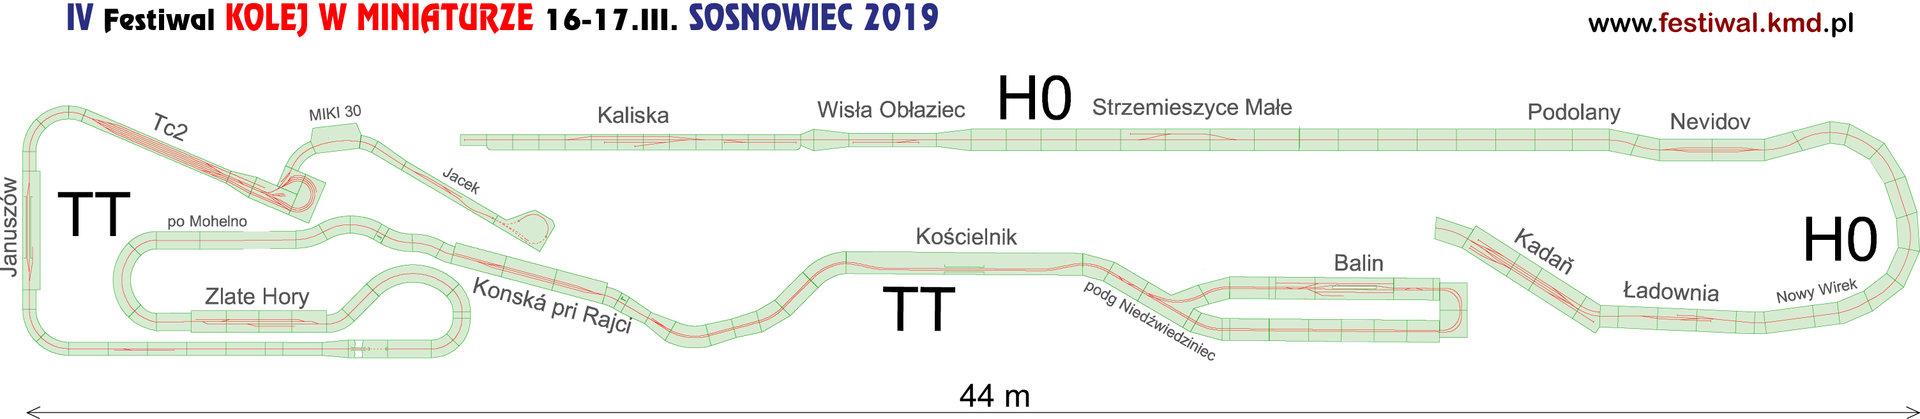 Sosnowiec2019-moduly-druk.jpg